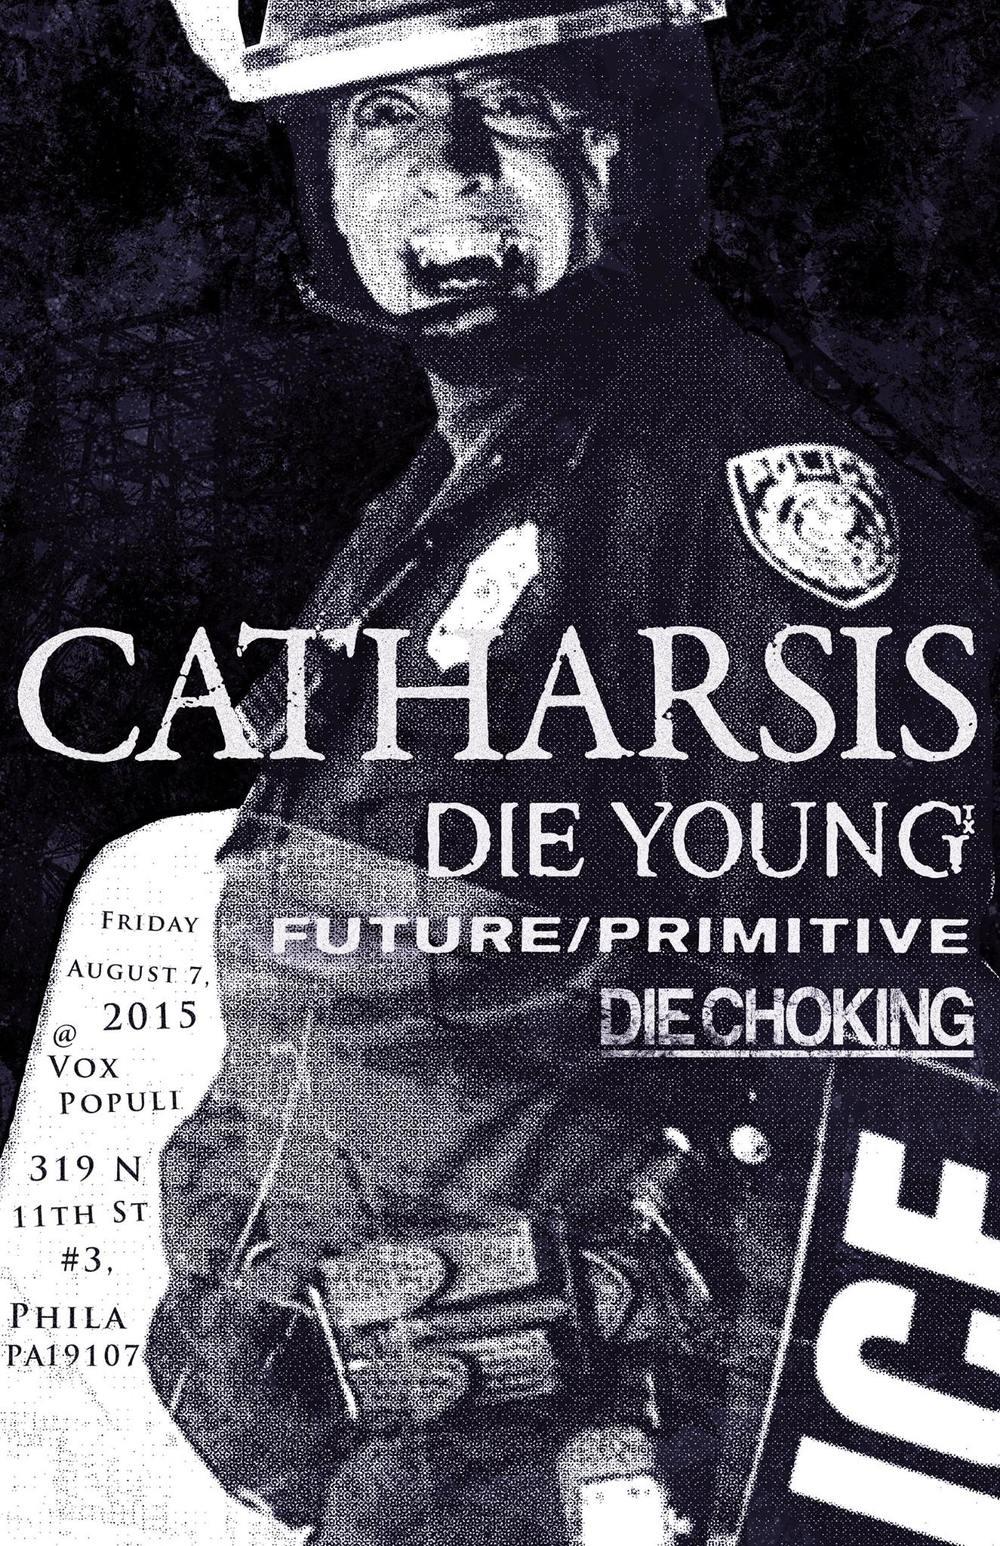 DC_Catharsis_Flyer.jpg